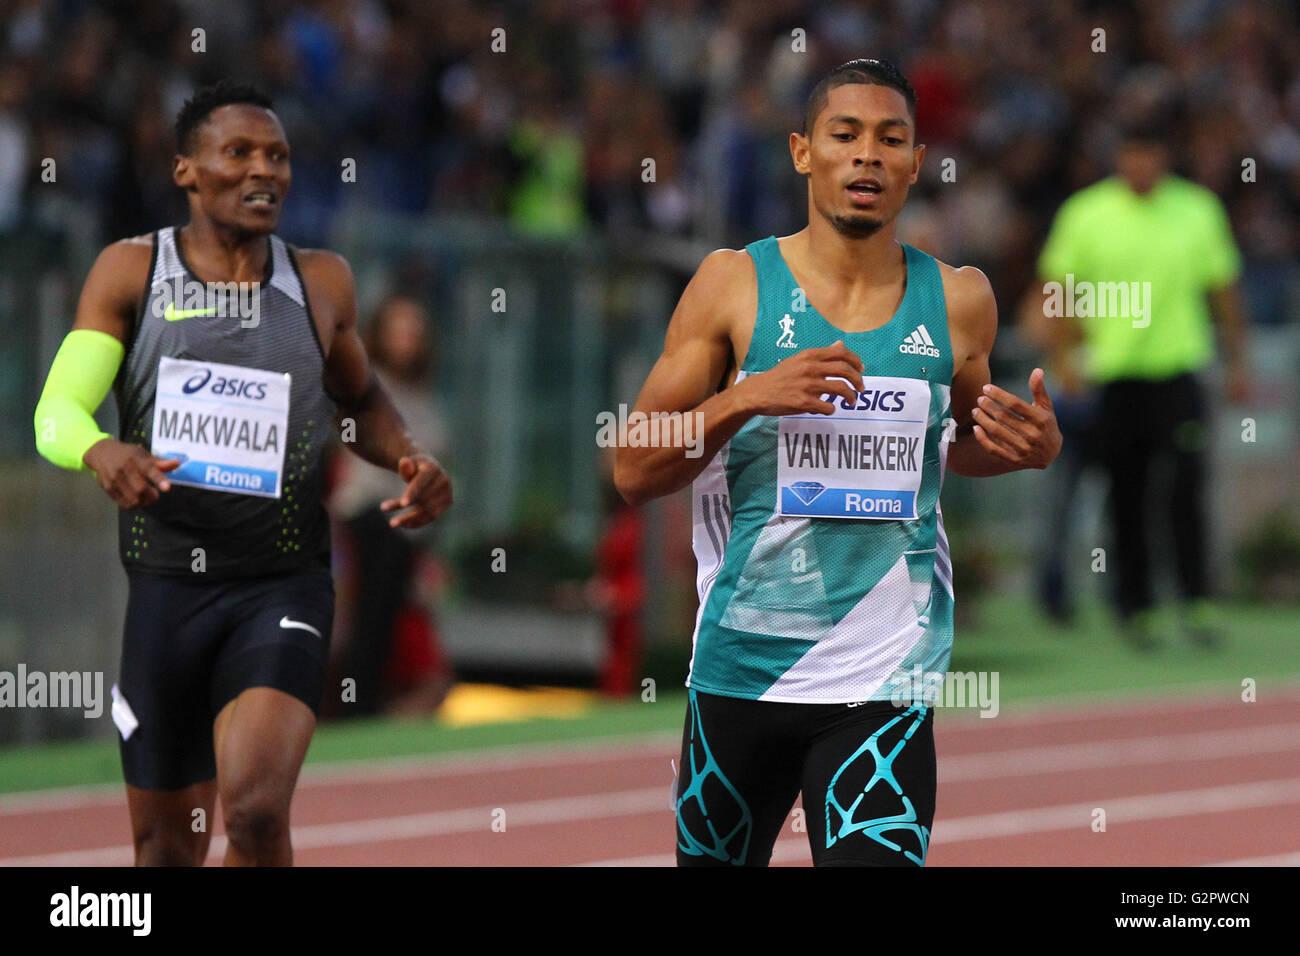 Stadio Olympico, Rome, Italy. 02nd June, 2016. IAAF Diamond League Rome. Niekerk winner of 400m men ahead of Isaac - Stock Image